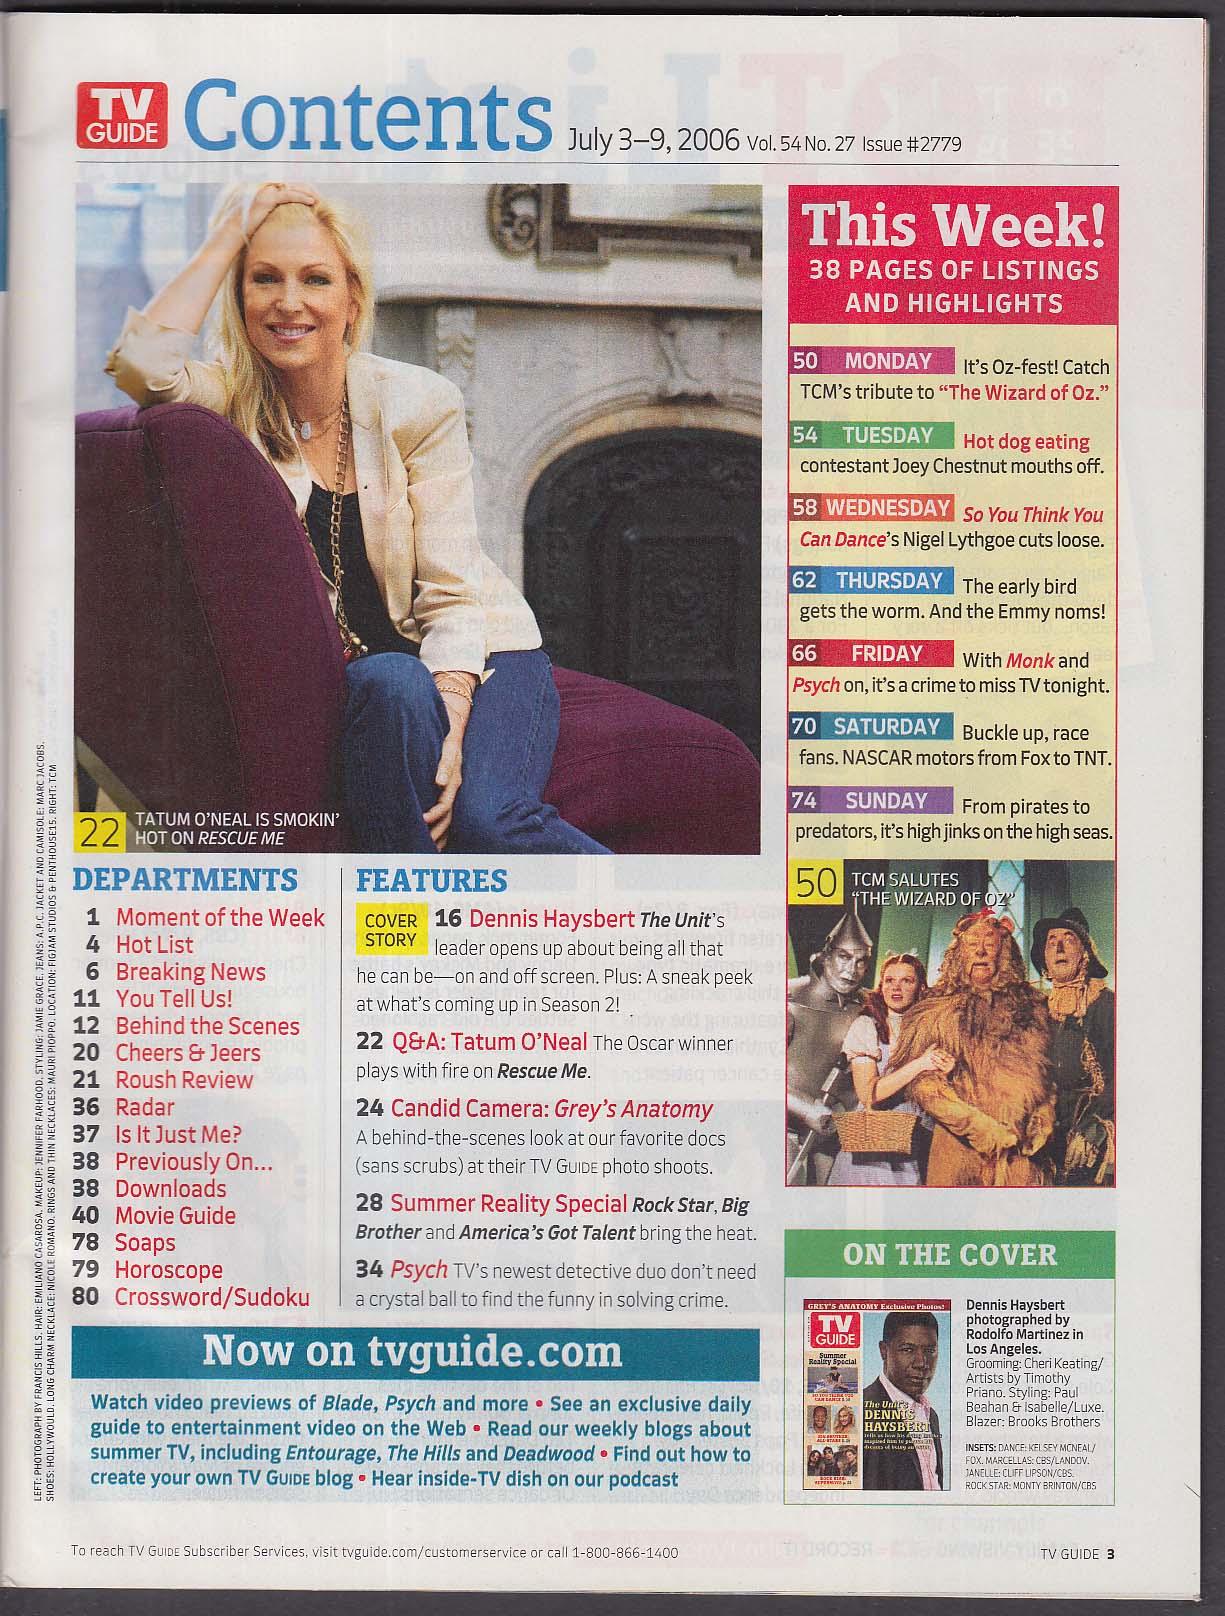 Tv Guide Dennis Haysbert Greys Anatomy Big Brother 73 79 2006